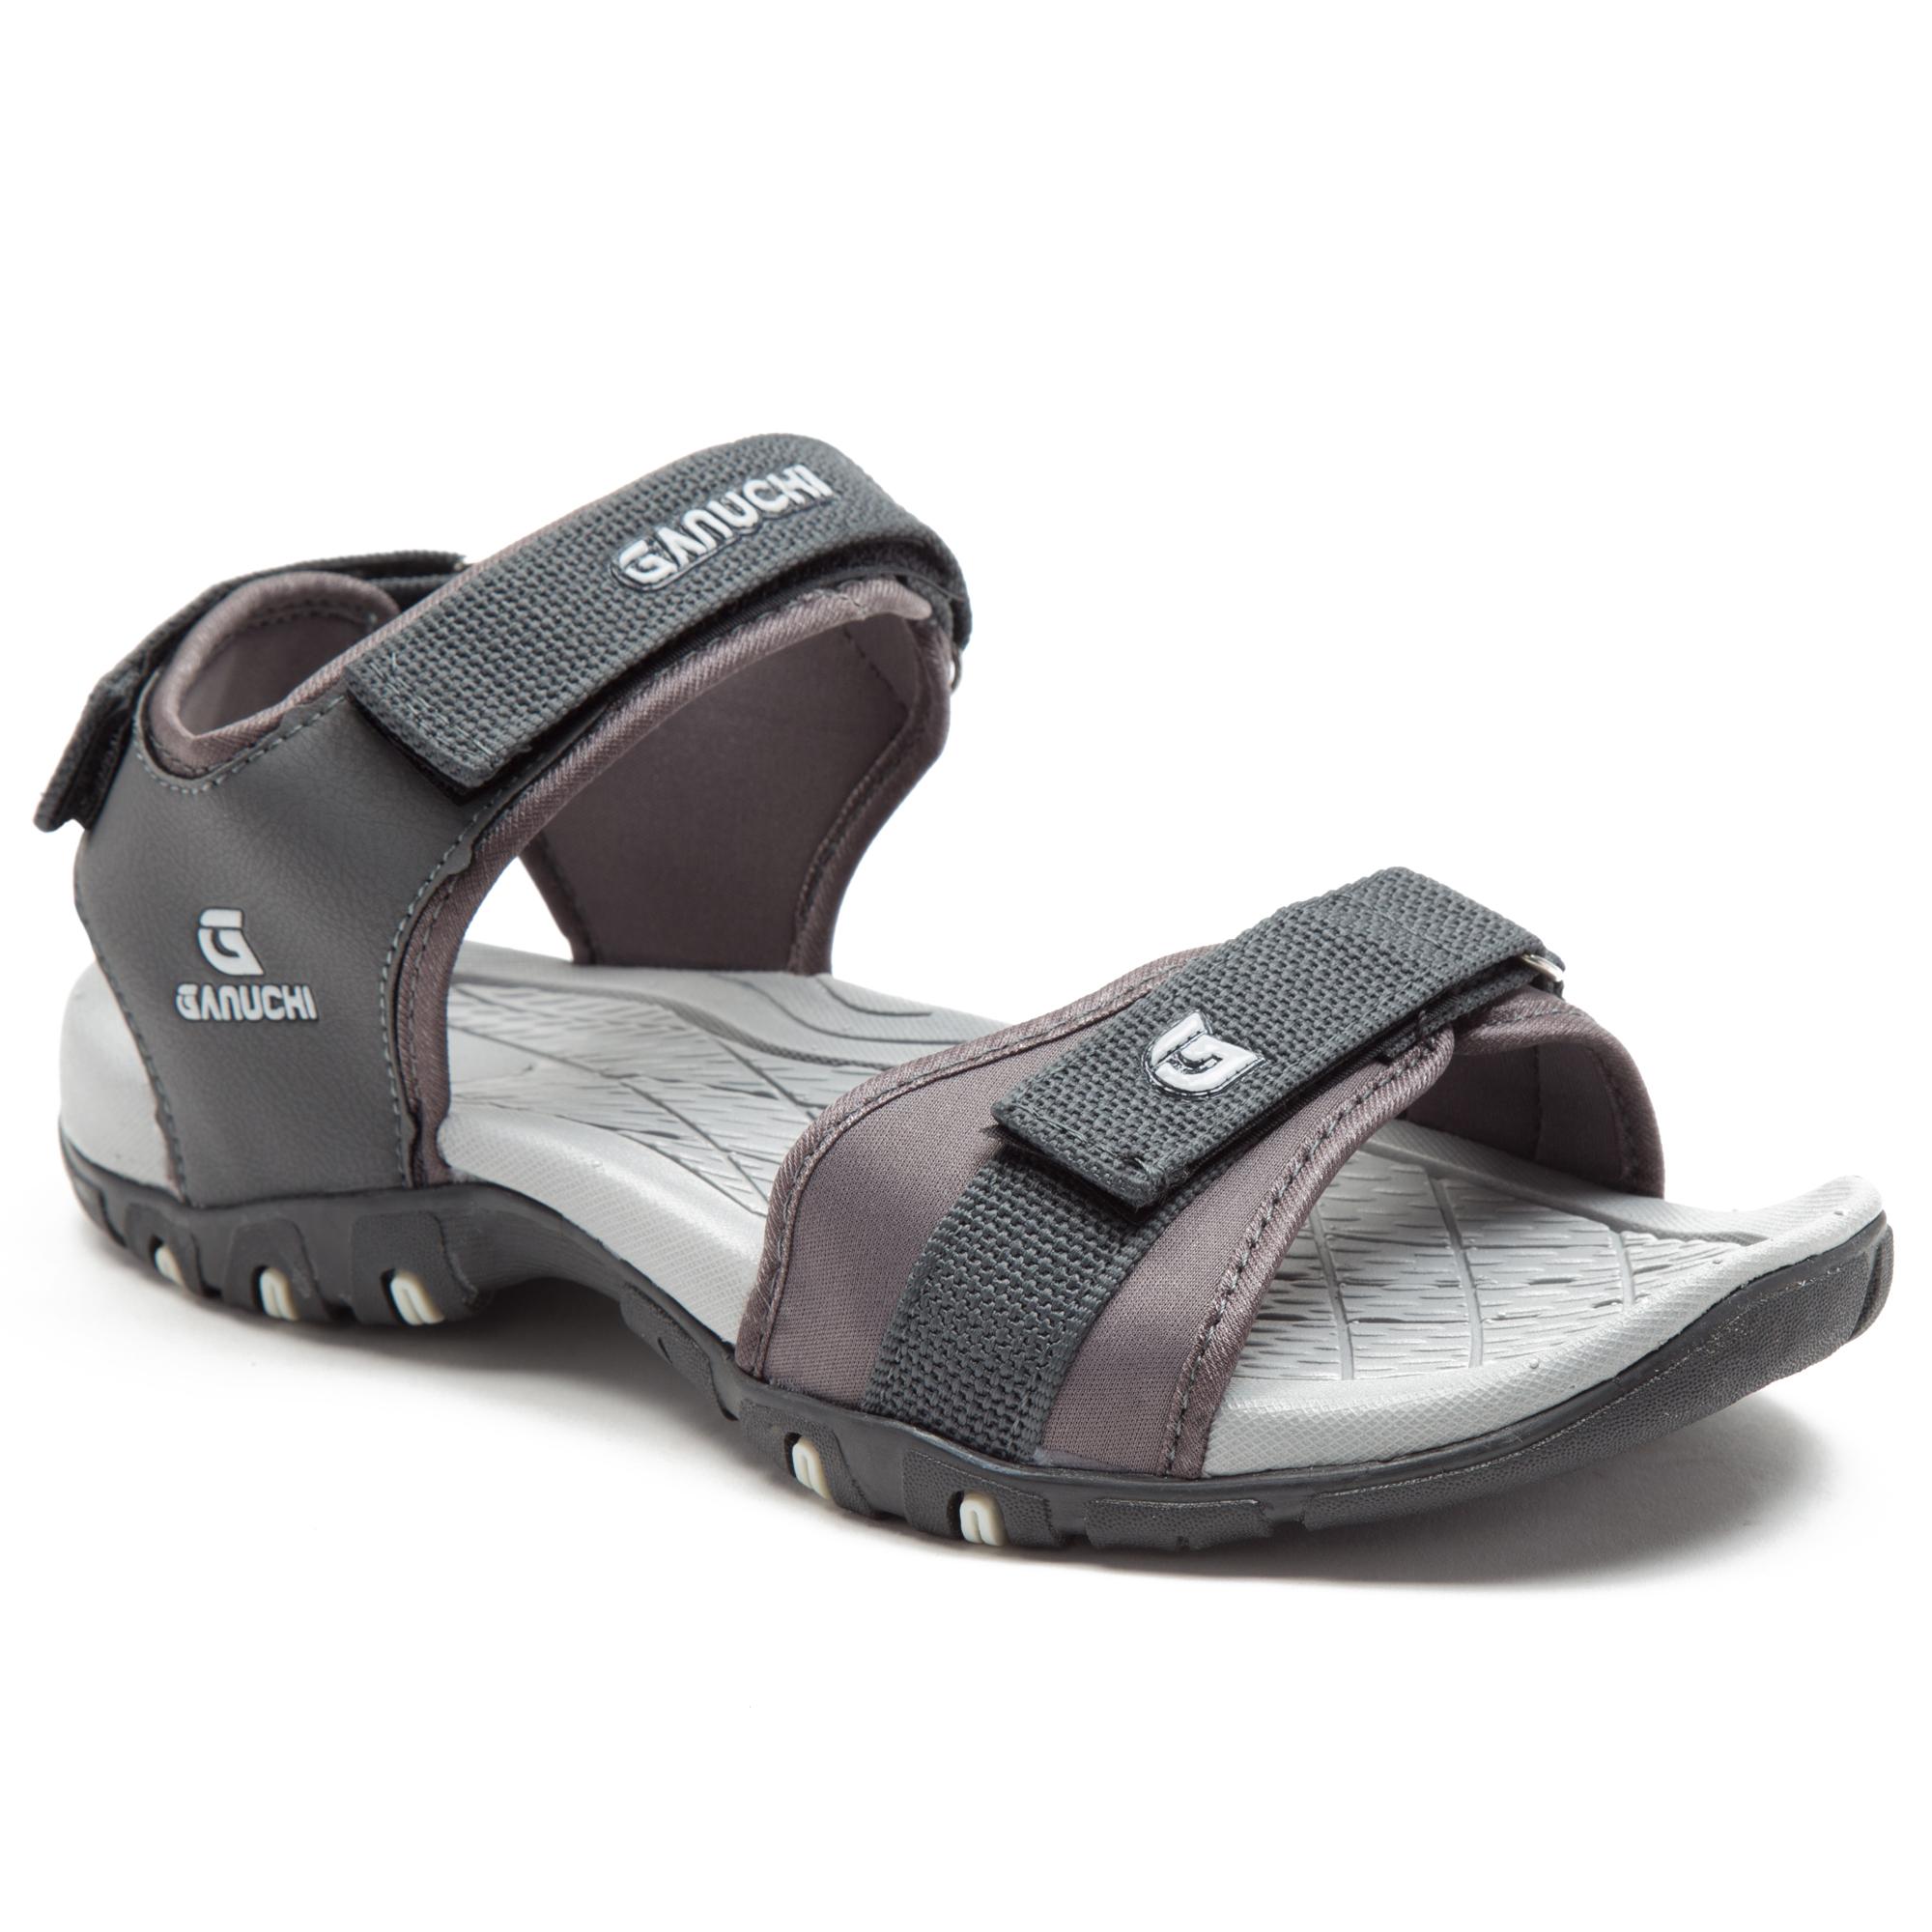 GANUCHI | Ganuchi by Franco Leone Men's Synthetic Grey Sandals